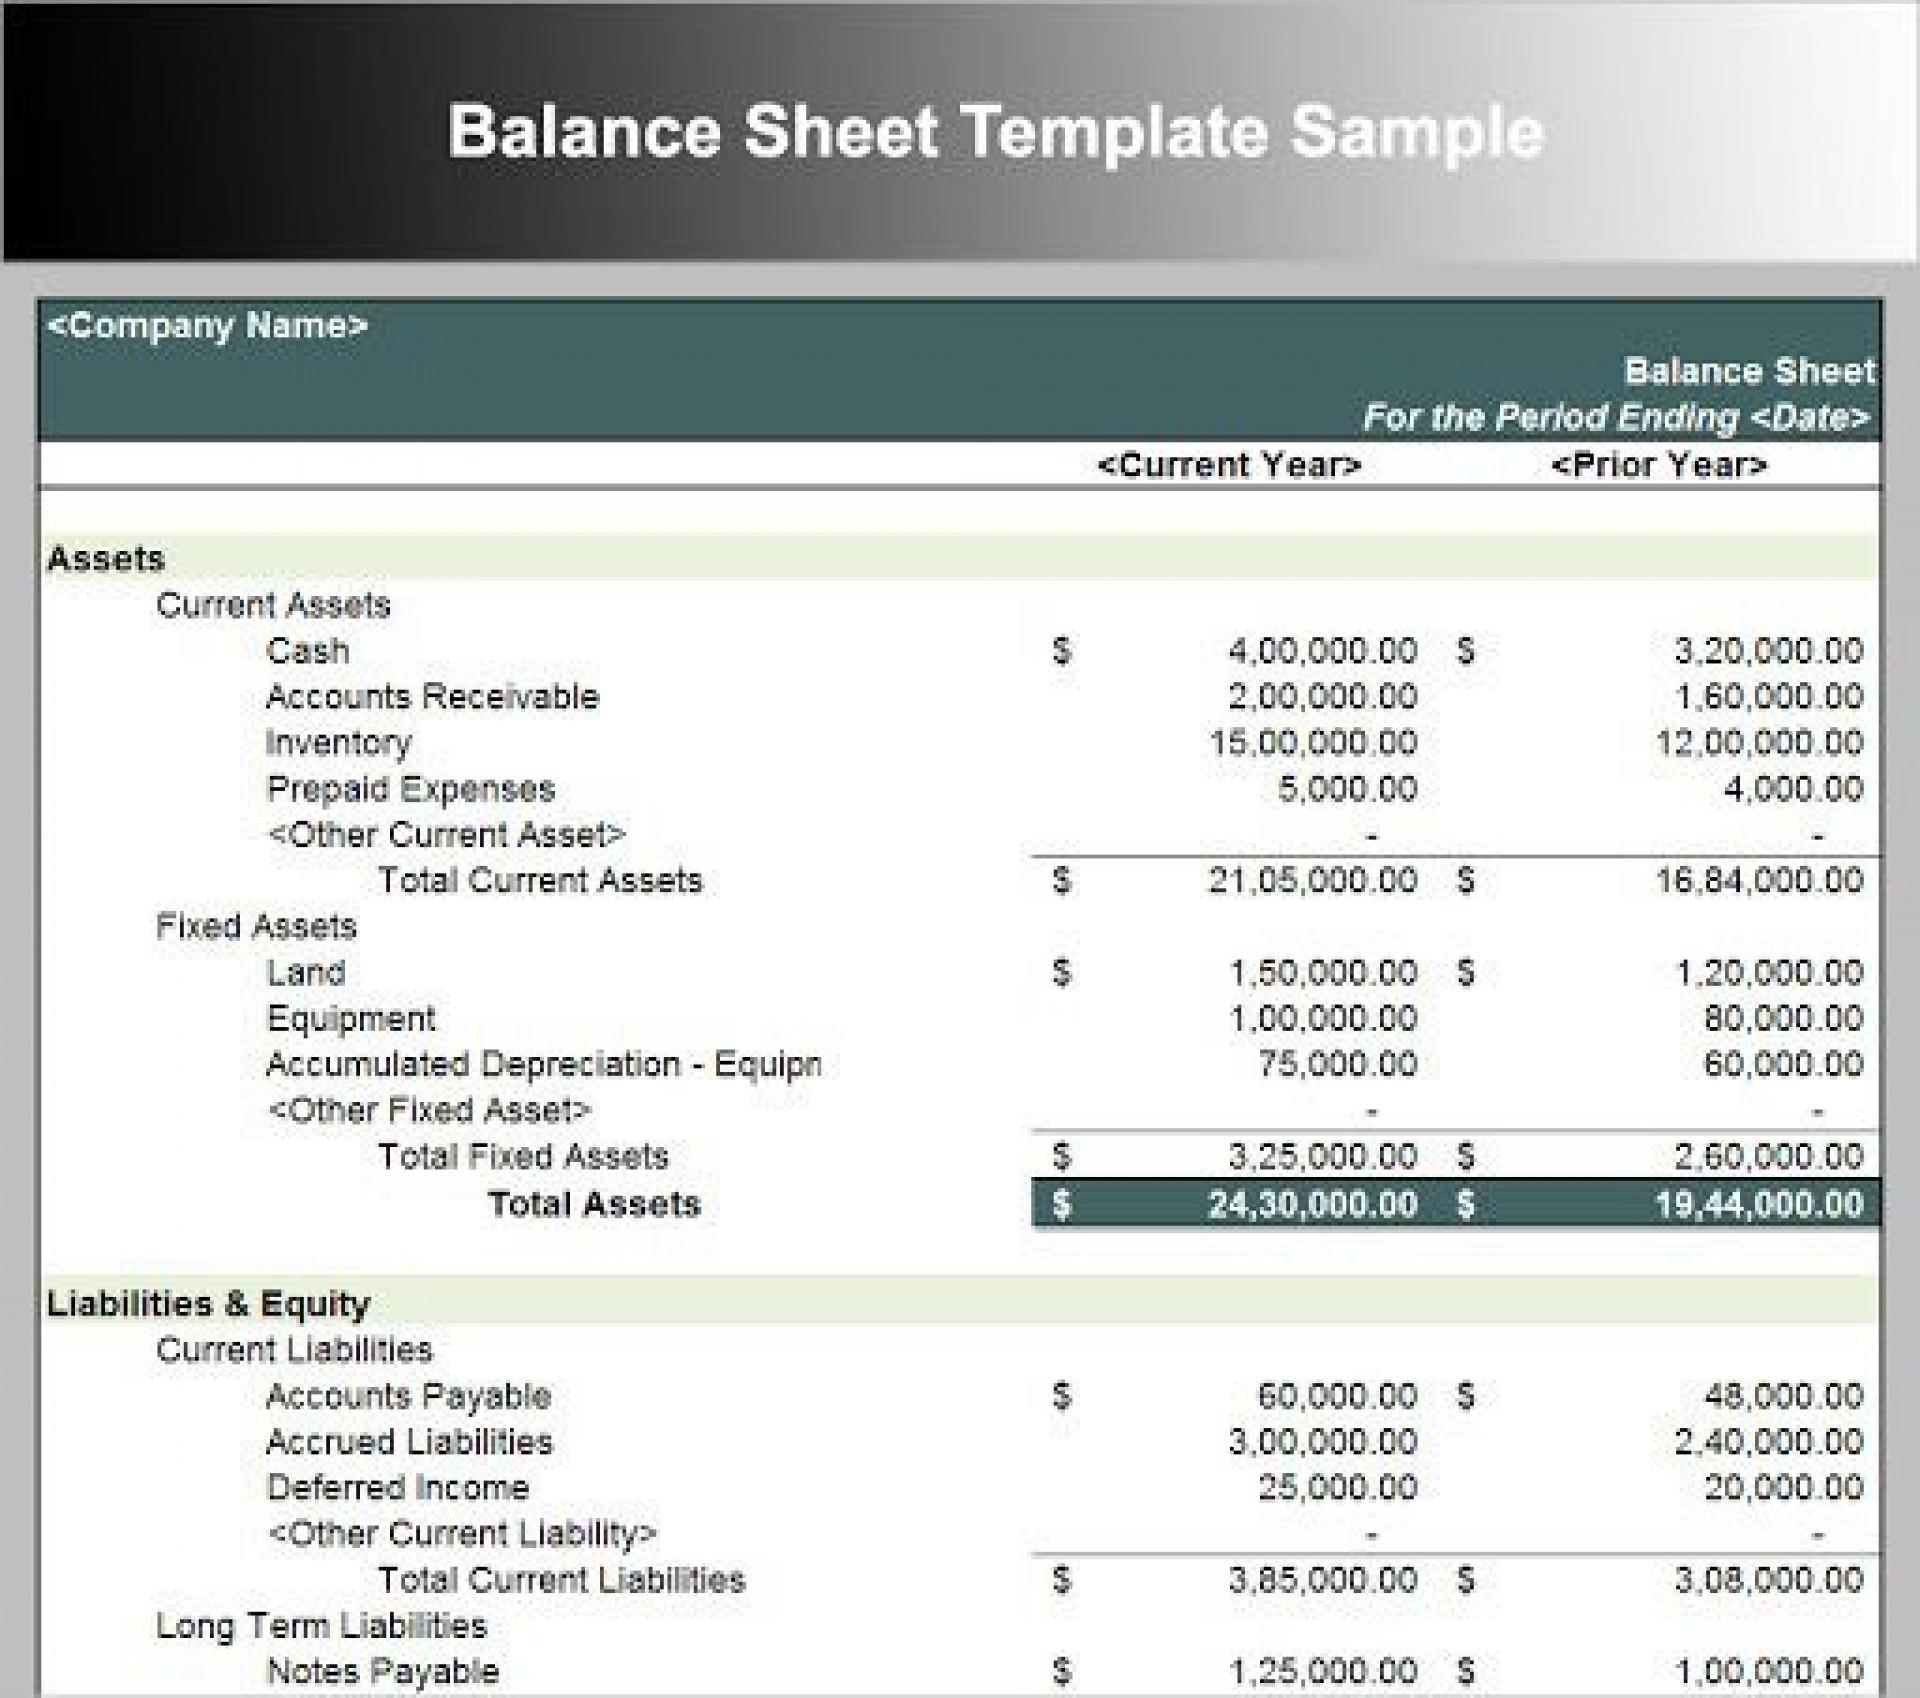 009 Sensational Busines Balance Sheet Template Concept  Word Excel Small Sample1920